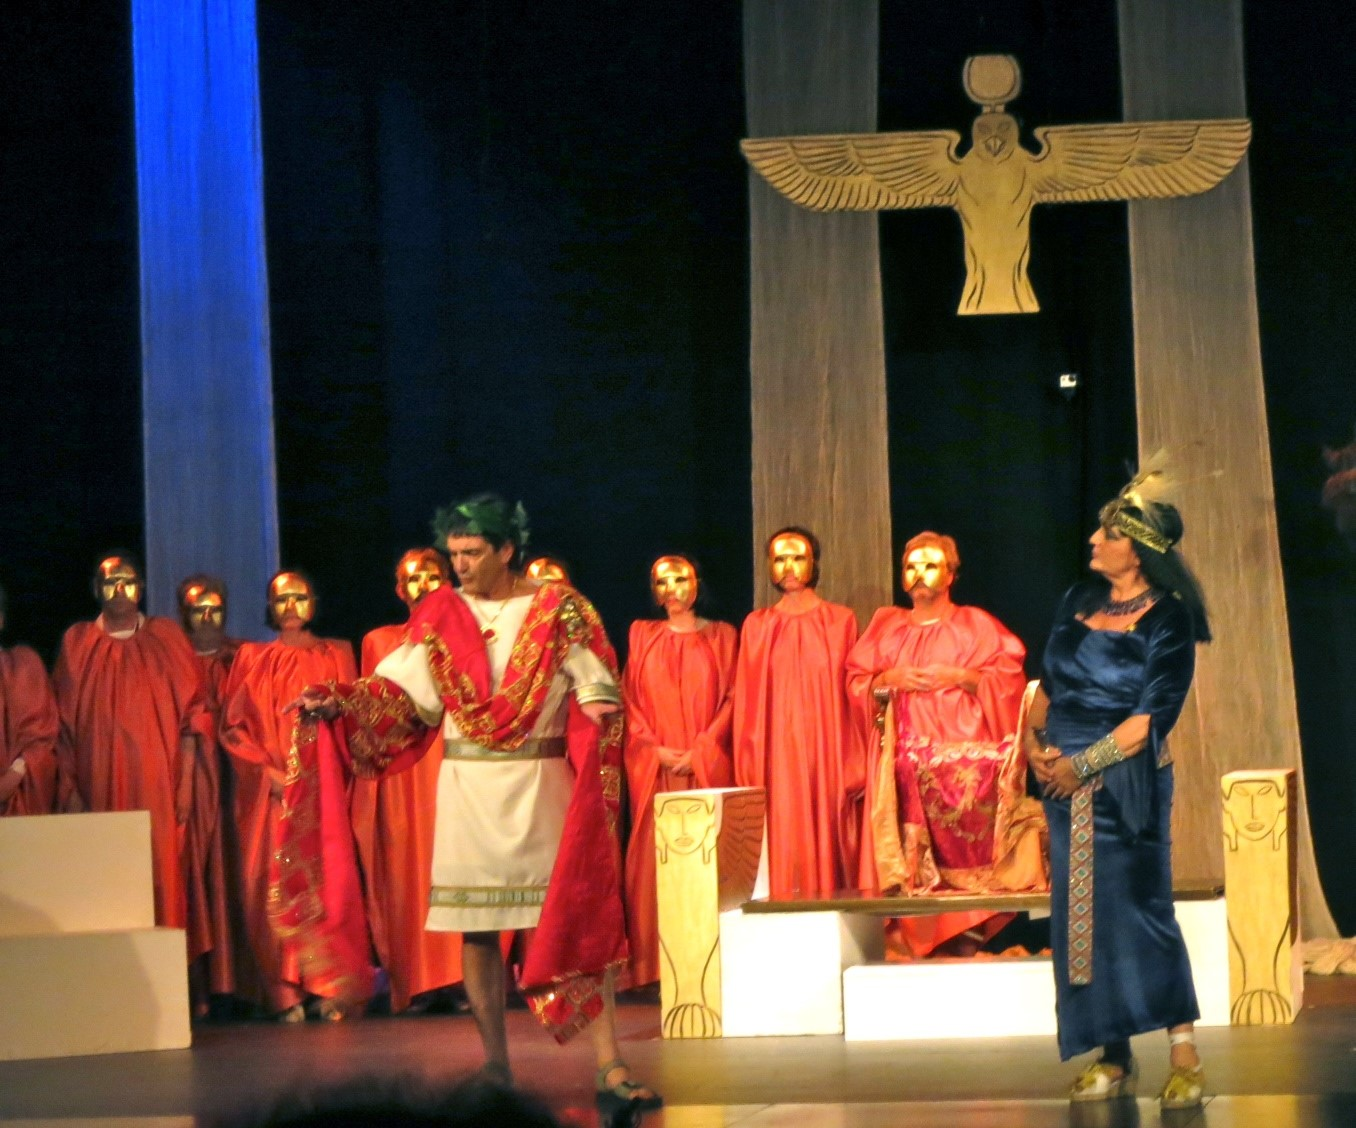 coro griego.jpg